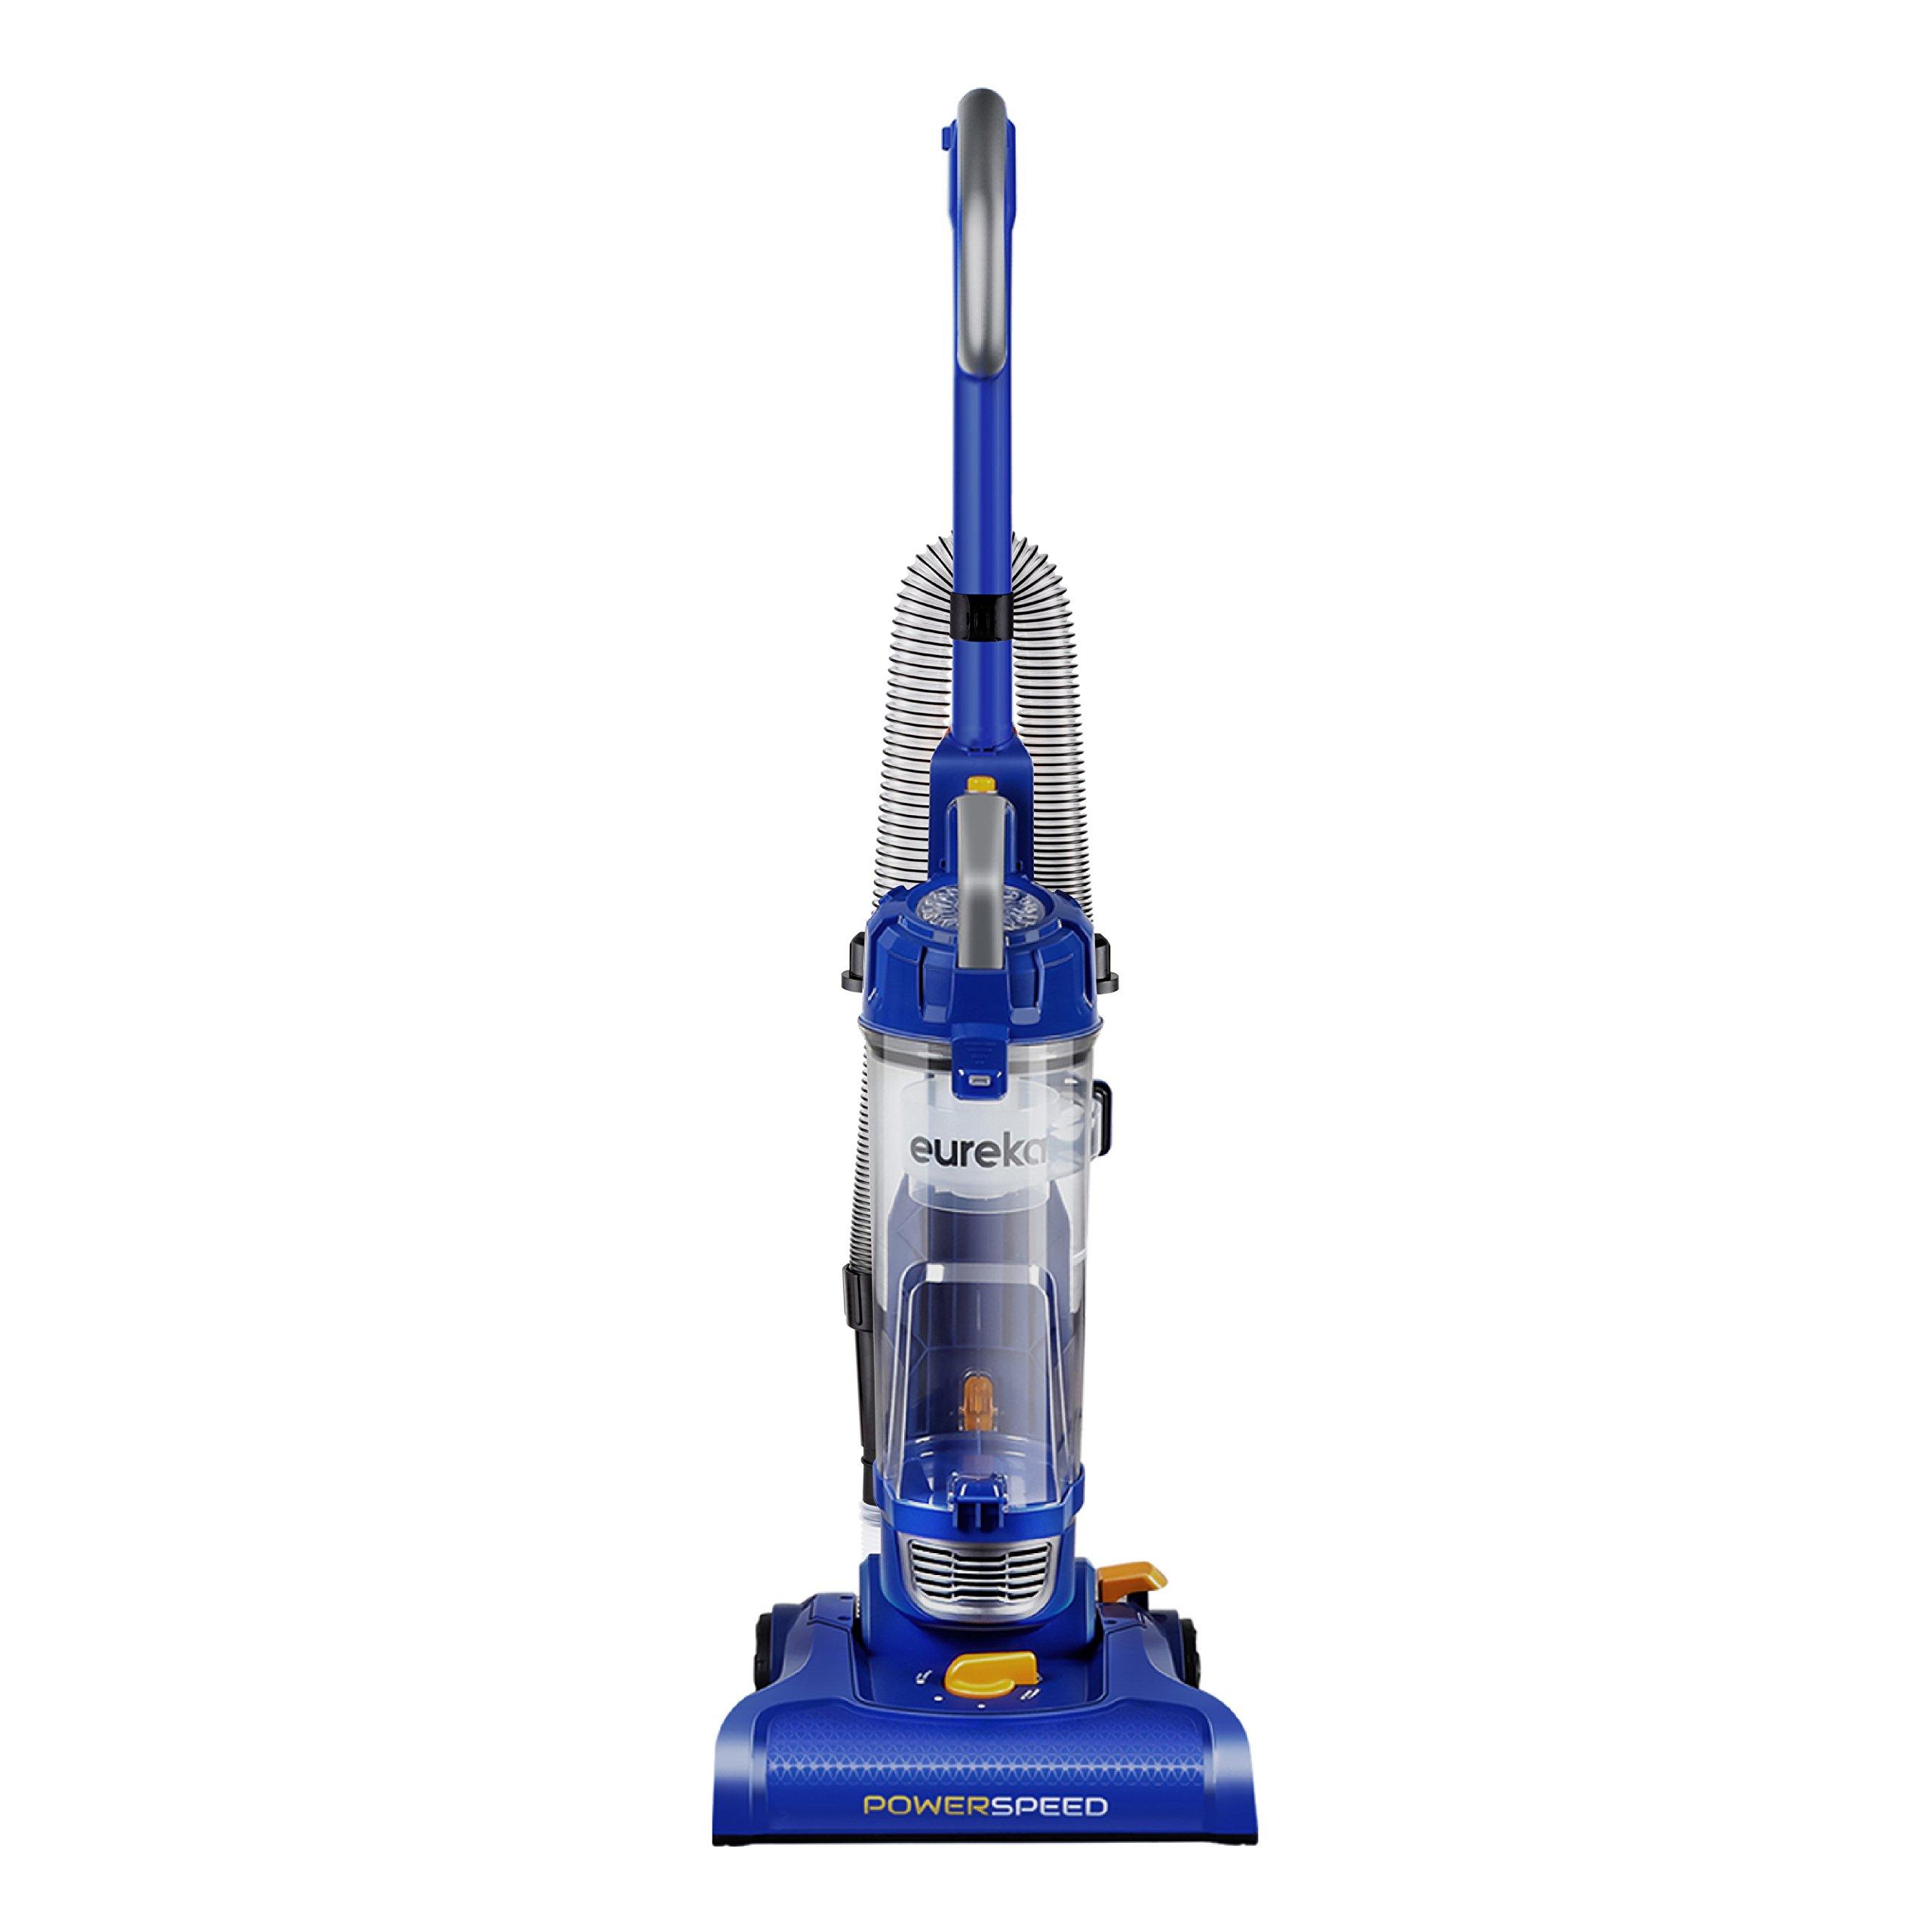 Eureka NEU182A PowerSpeed Lightweight Bagless Upright Vacuum Cleaner